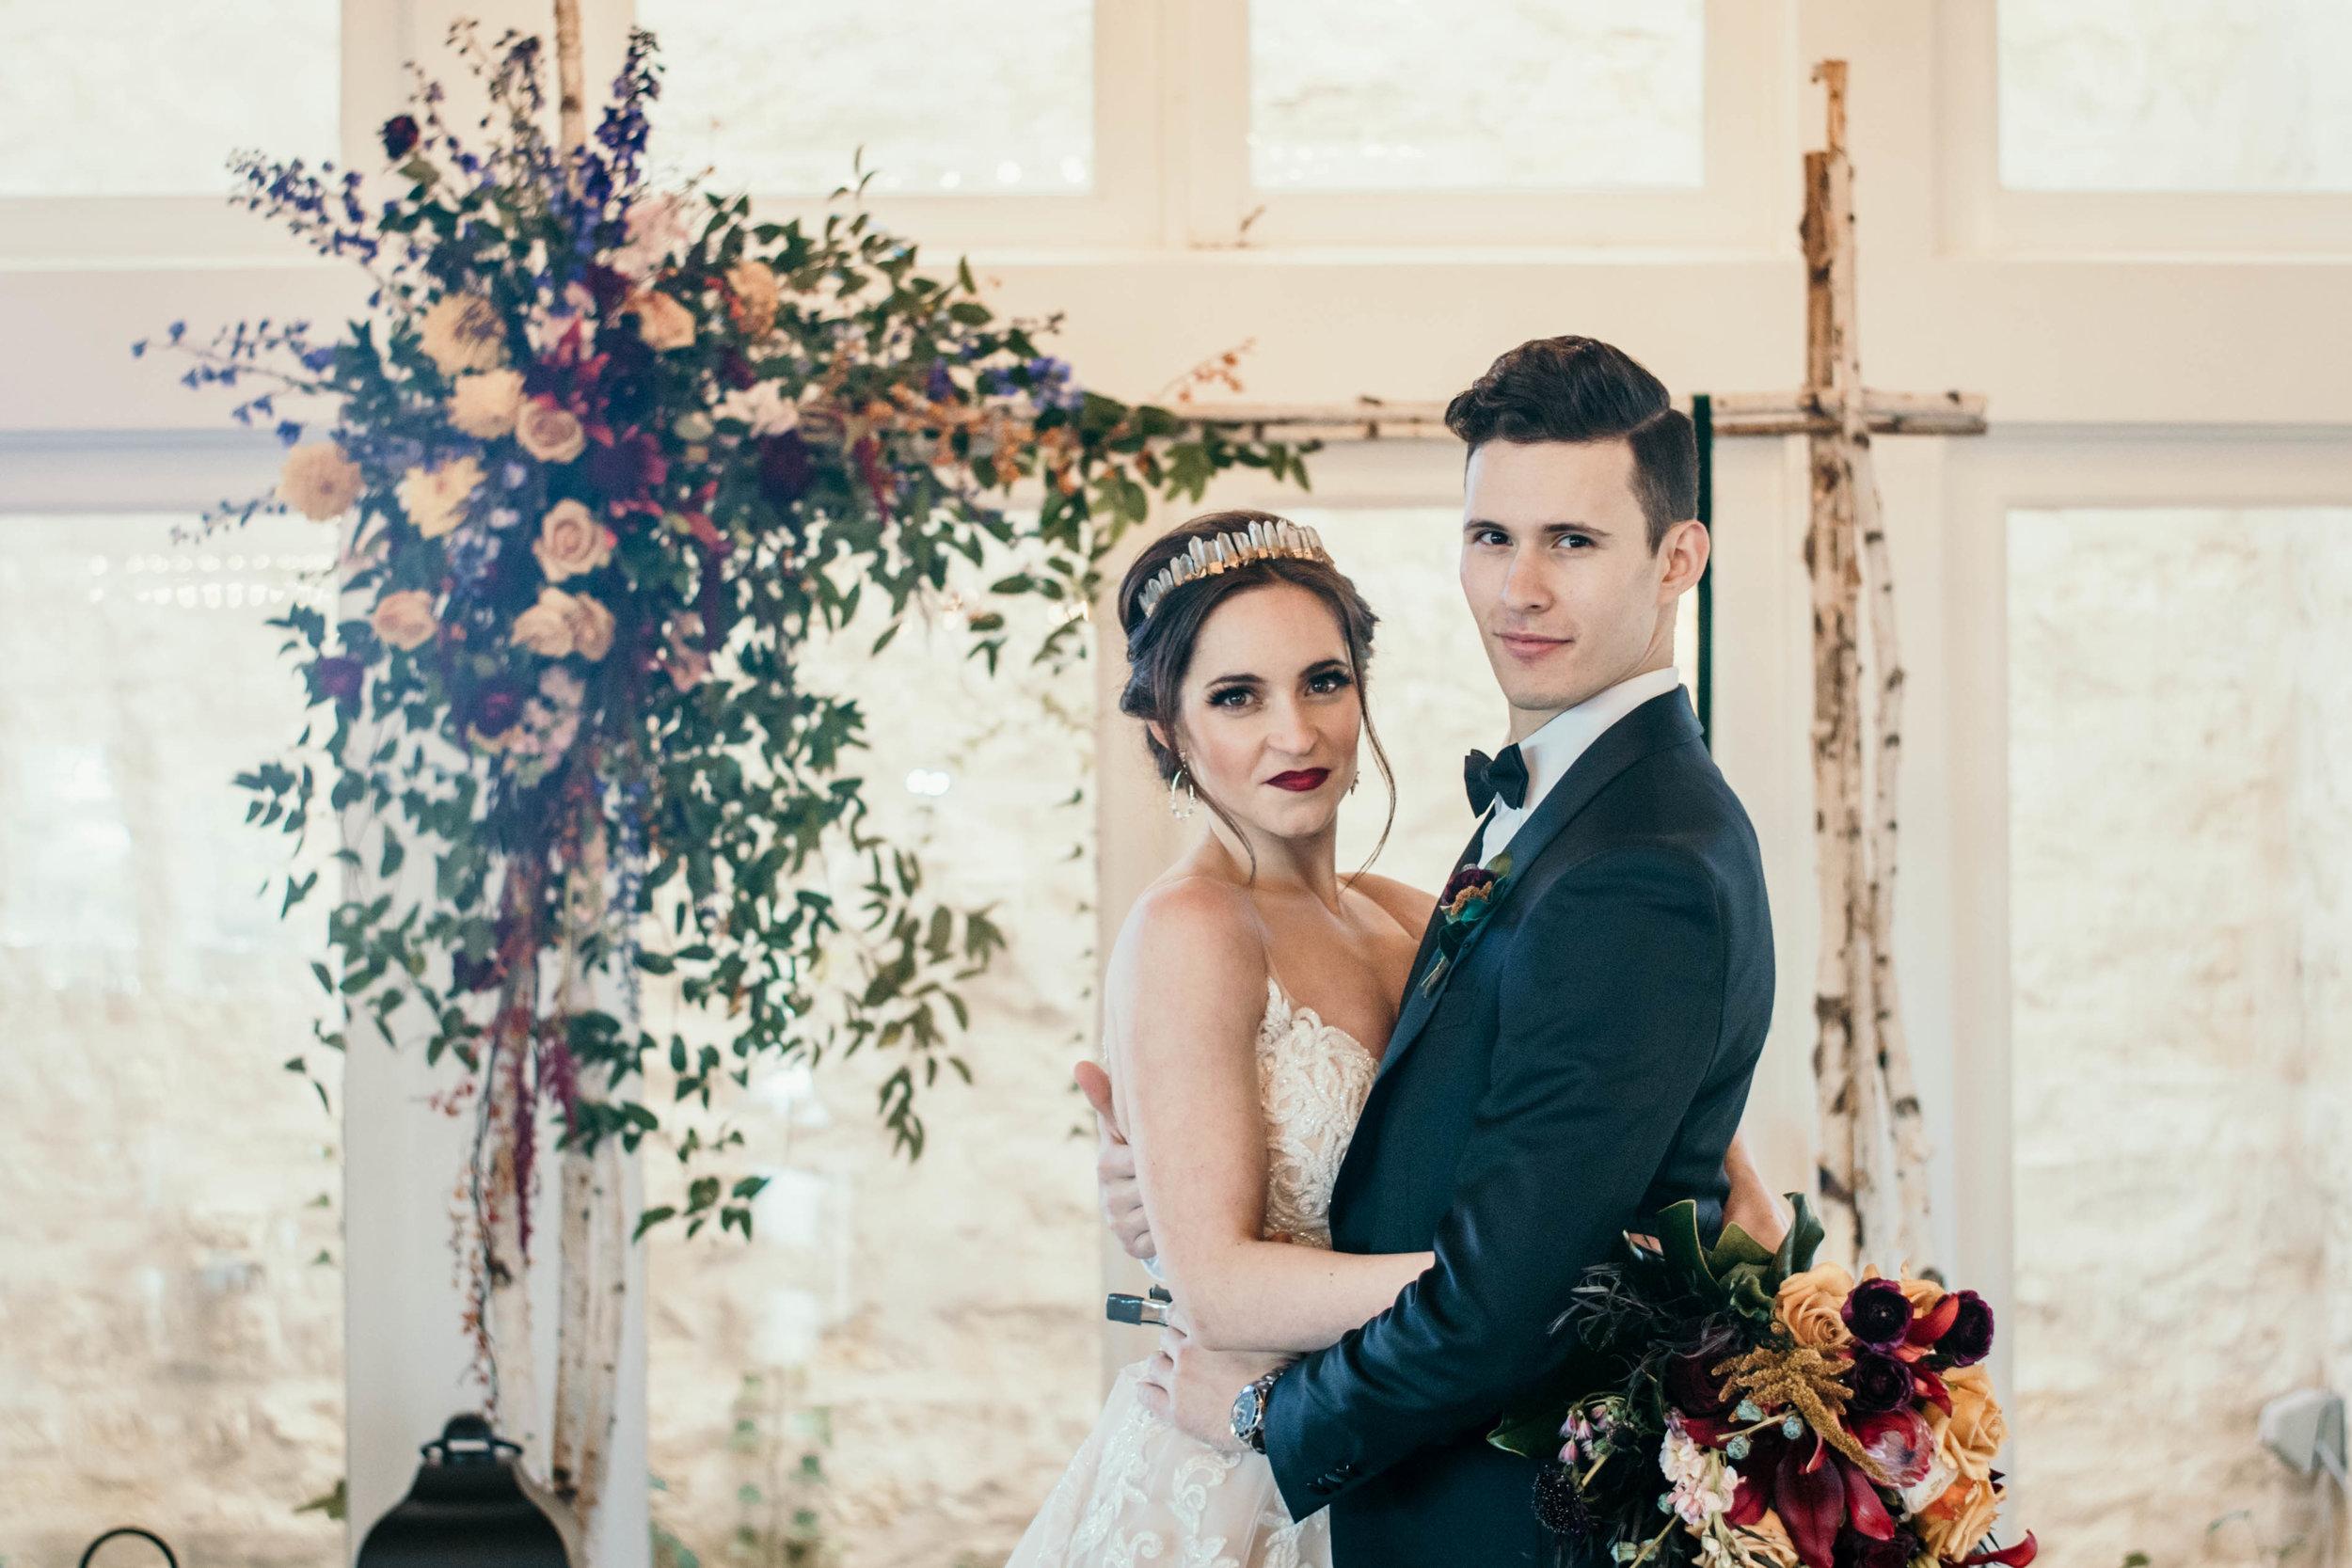 Austin Wedding Videographer - Dolls for Dolls (270 of 323).jpg